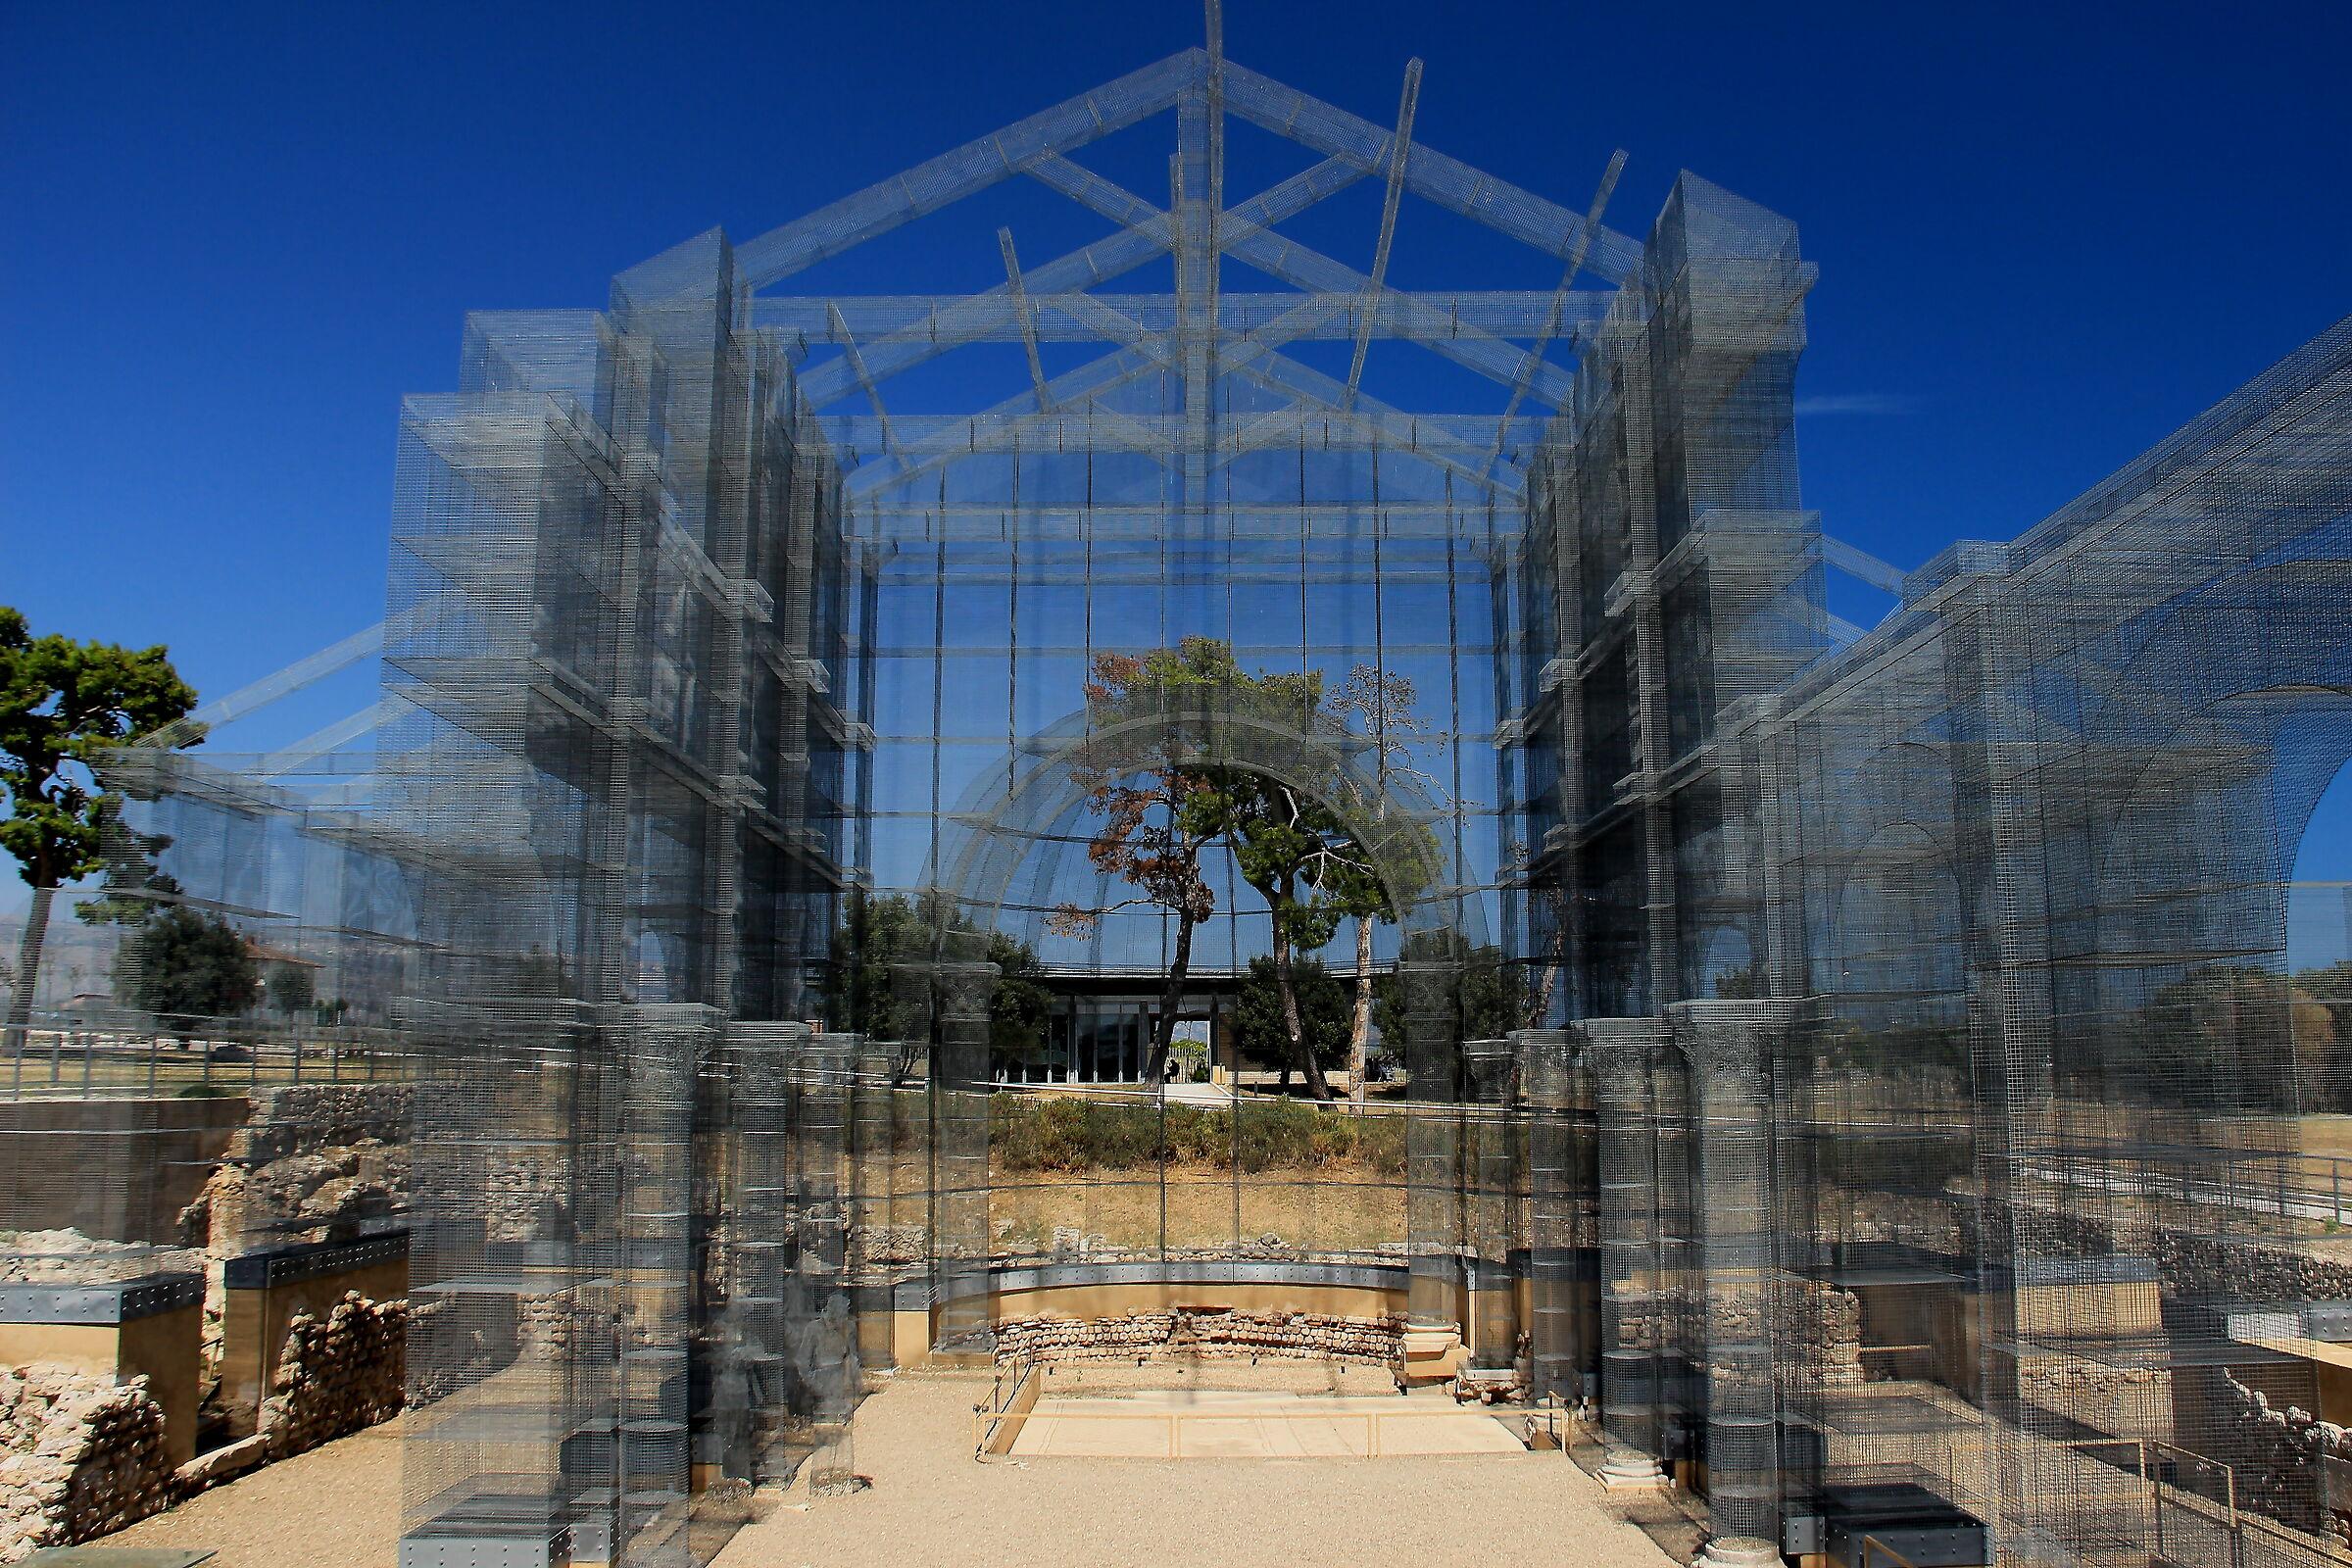 Manfredonia. Basilica in wire mesh of Siponto...